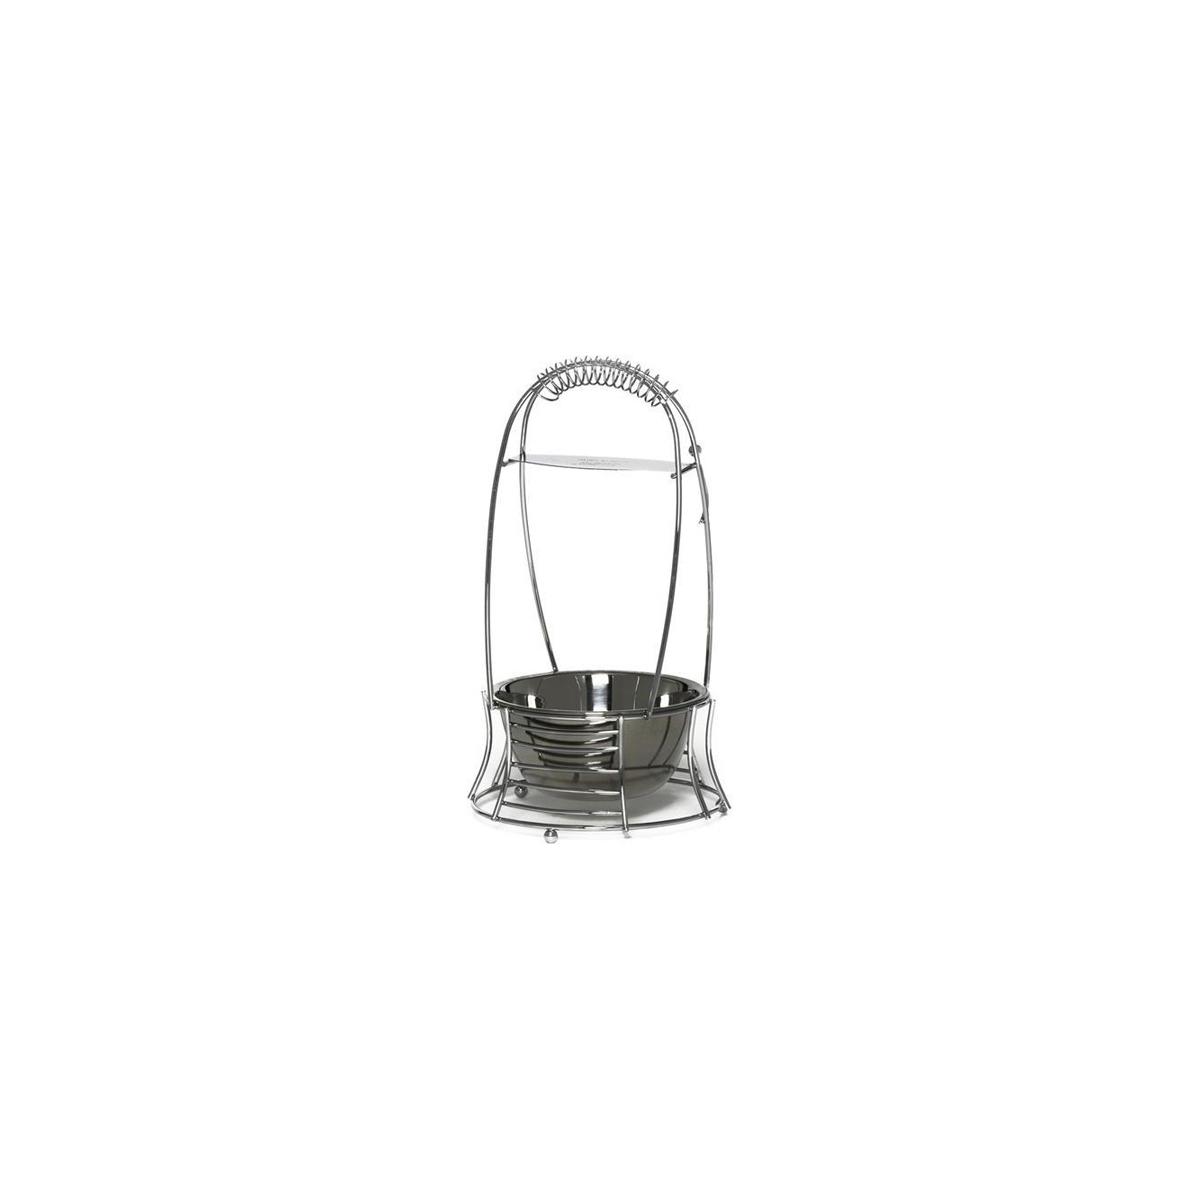 Small coal basket